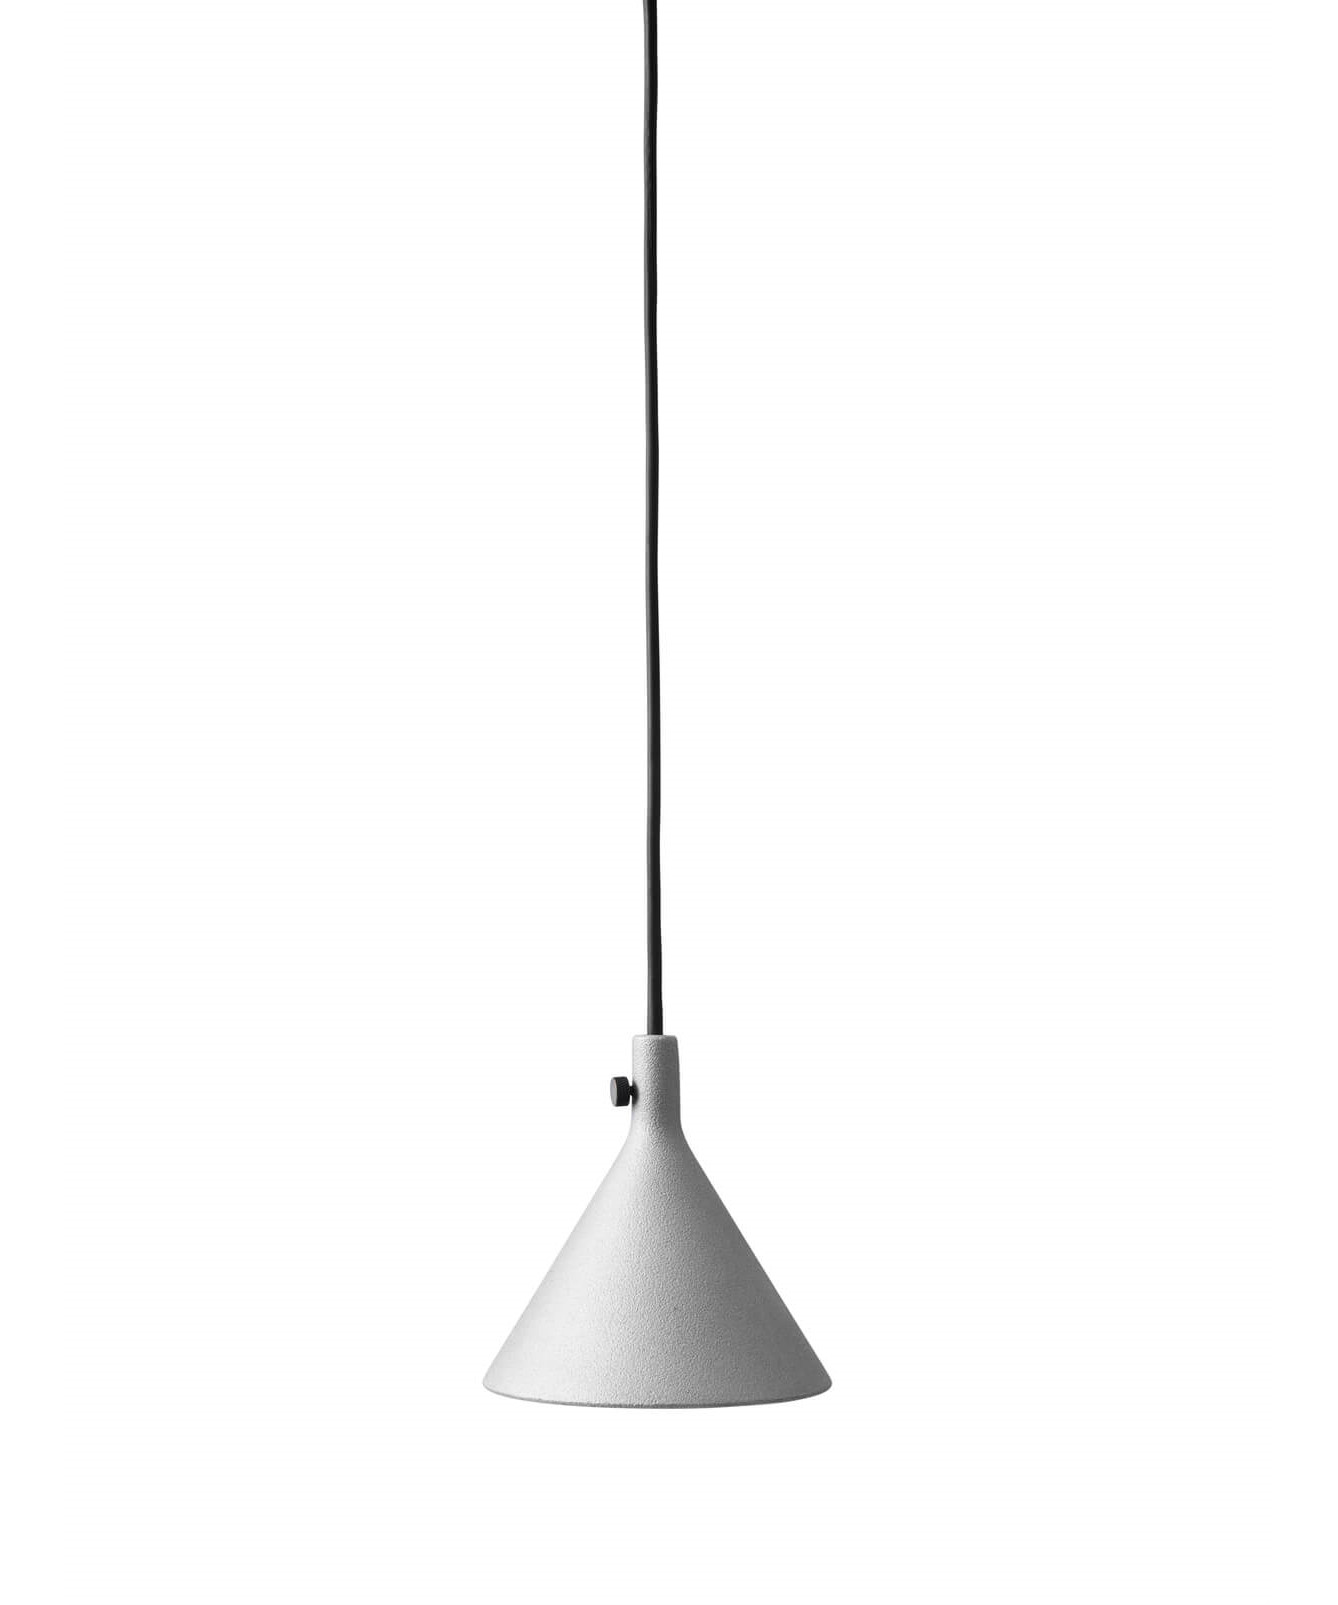 Image of   Cast Pendel Shape 1 Aluminum - Menu